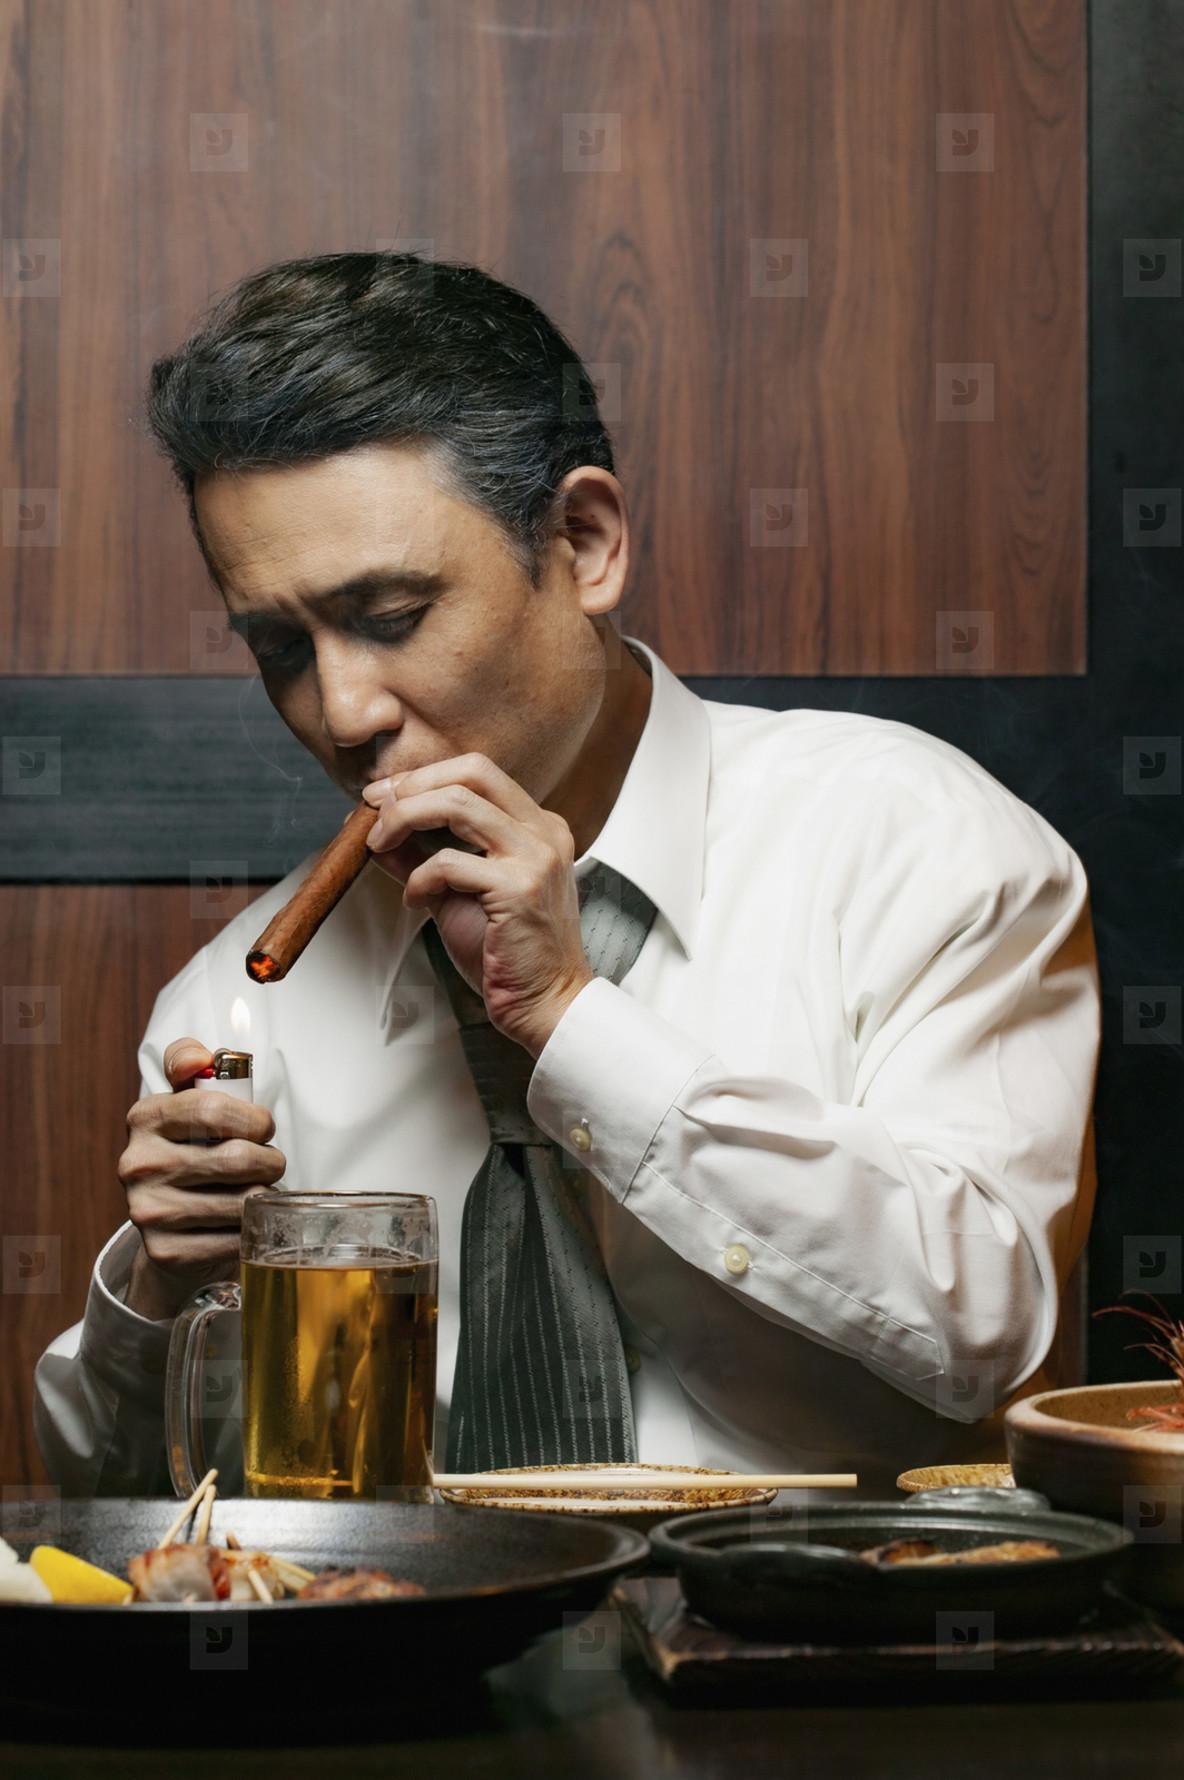 Businessman lighting cigar at restaurant table